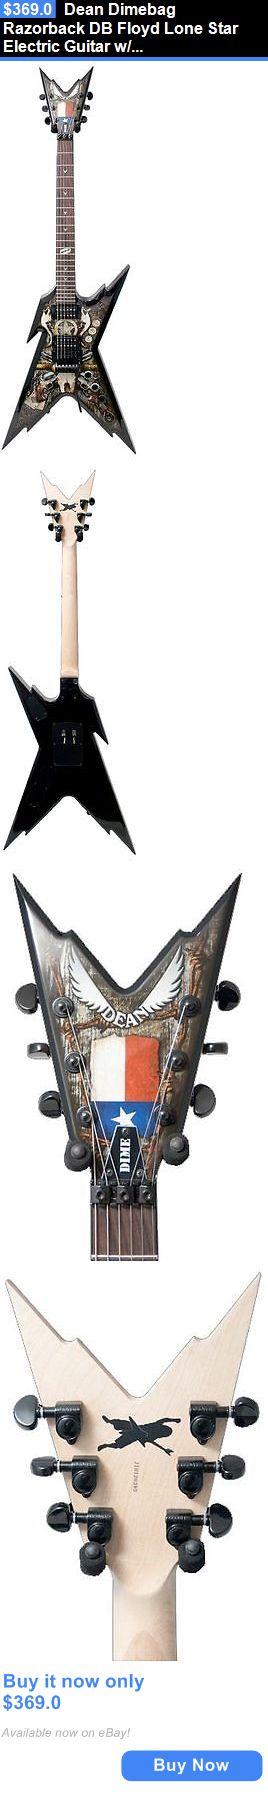 musical instruments: Dean Dimebag Razorback Db Floyd Lone Star Electric Guitar W/ Case, New! BUY IT NOW ONLY: $369.0